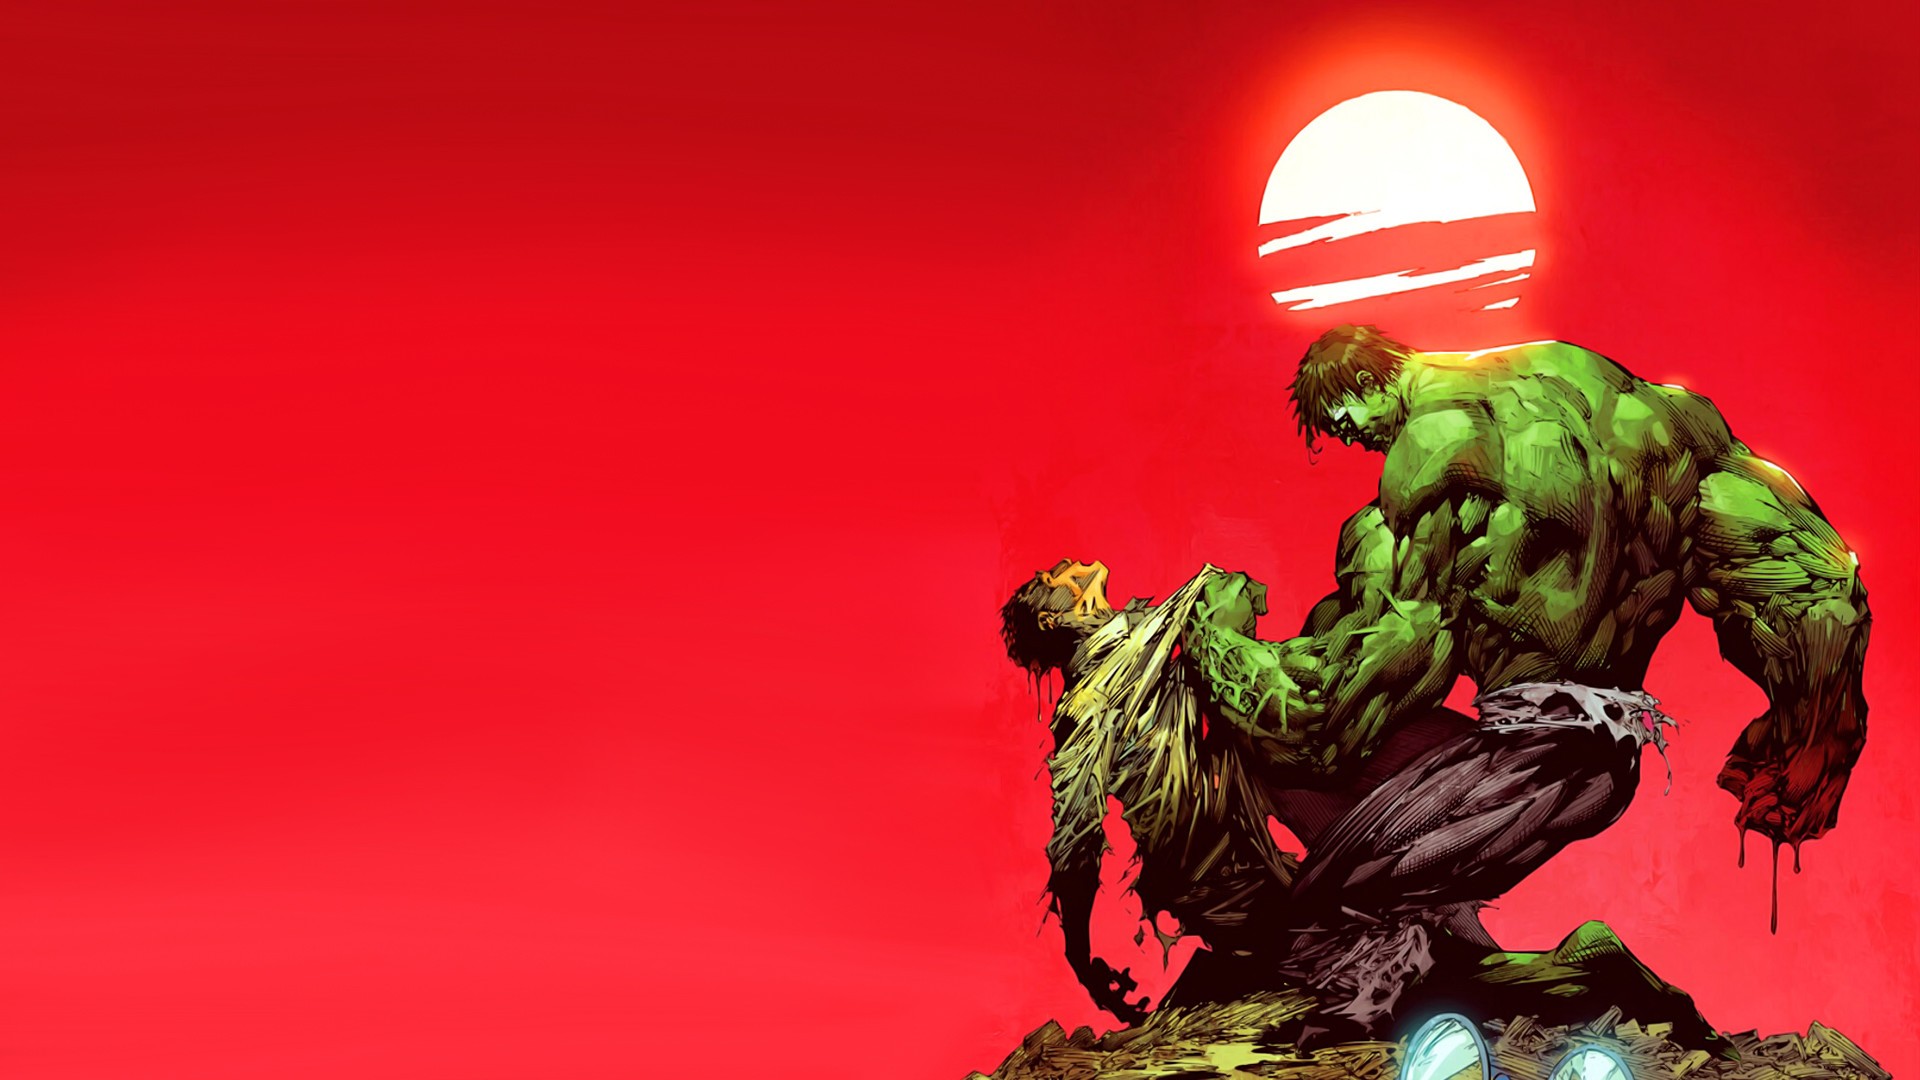 Dr. Bruce Banner Versus The Incredible Hulk HD Desktop Background